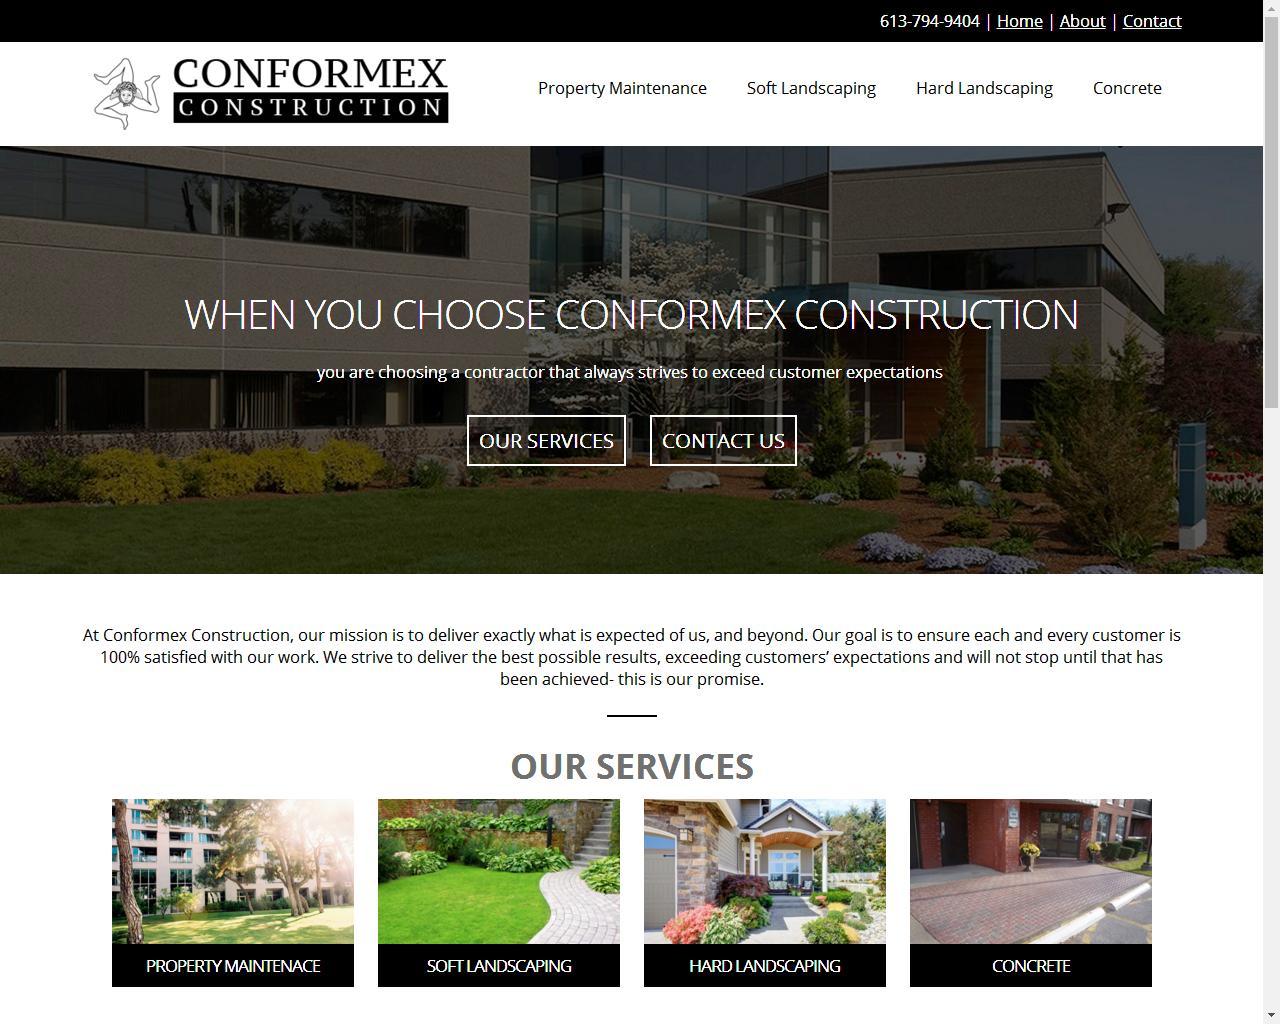 conformex